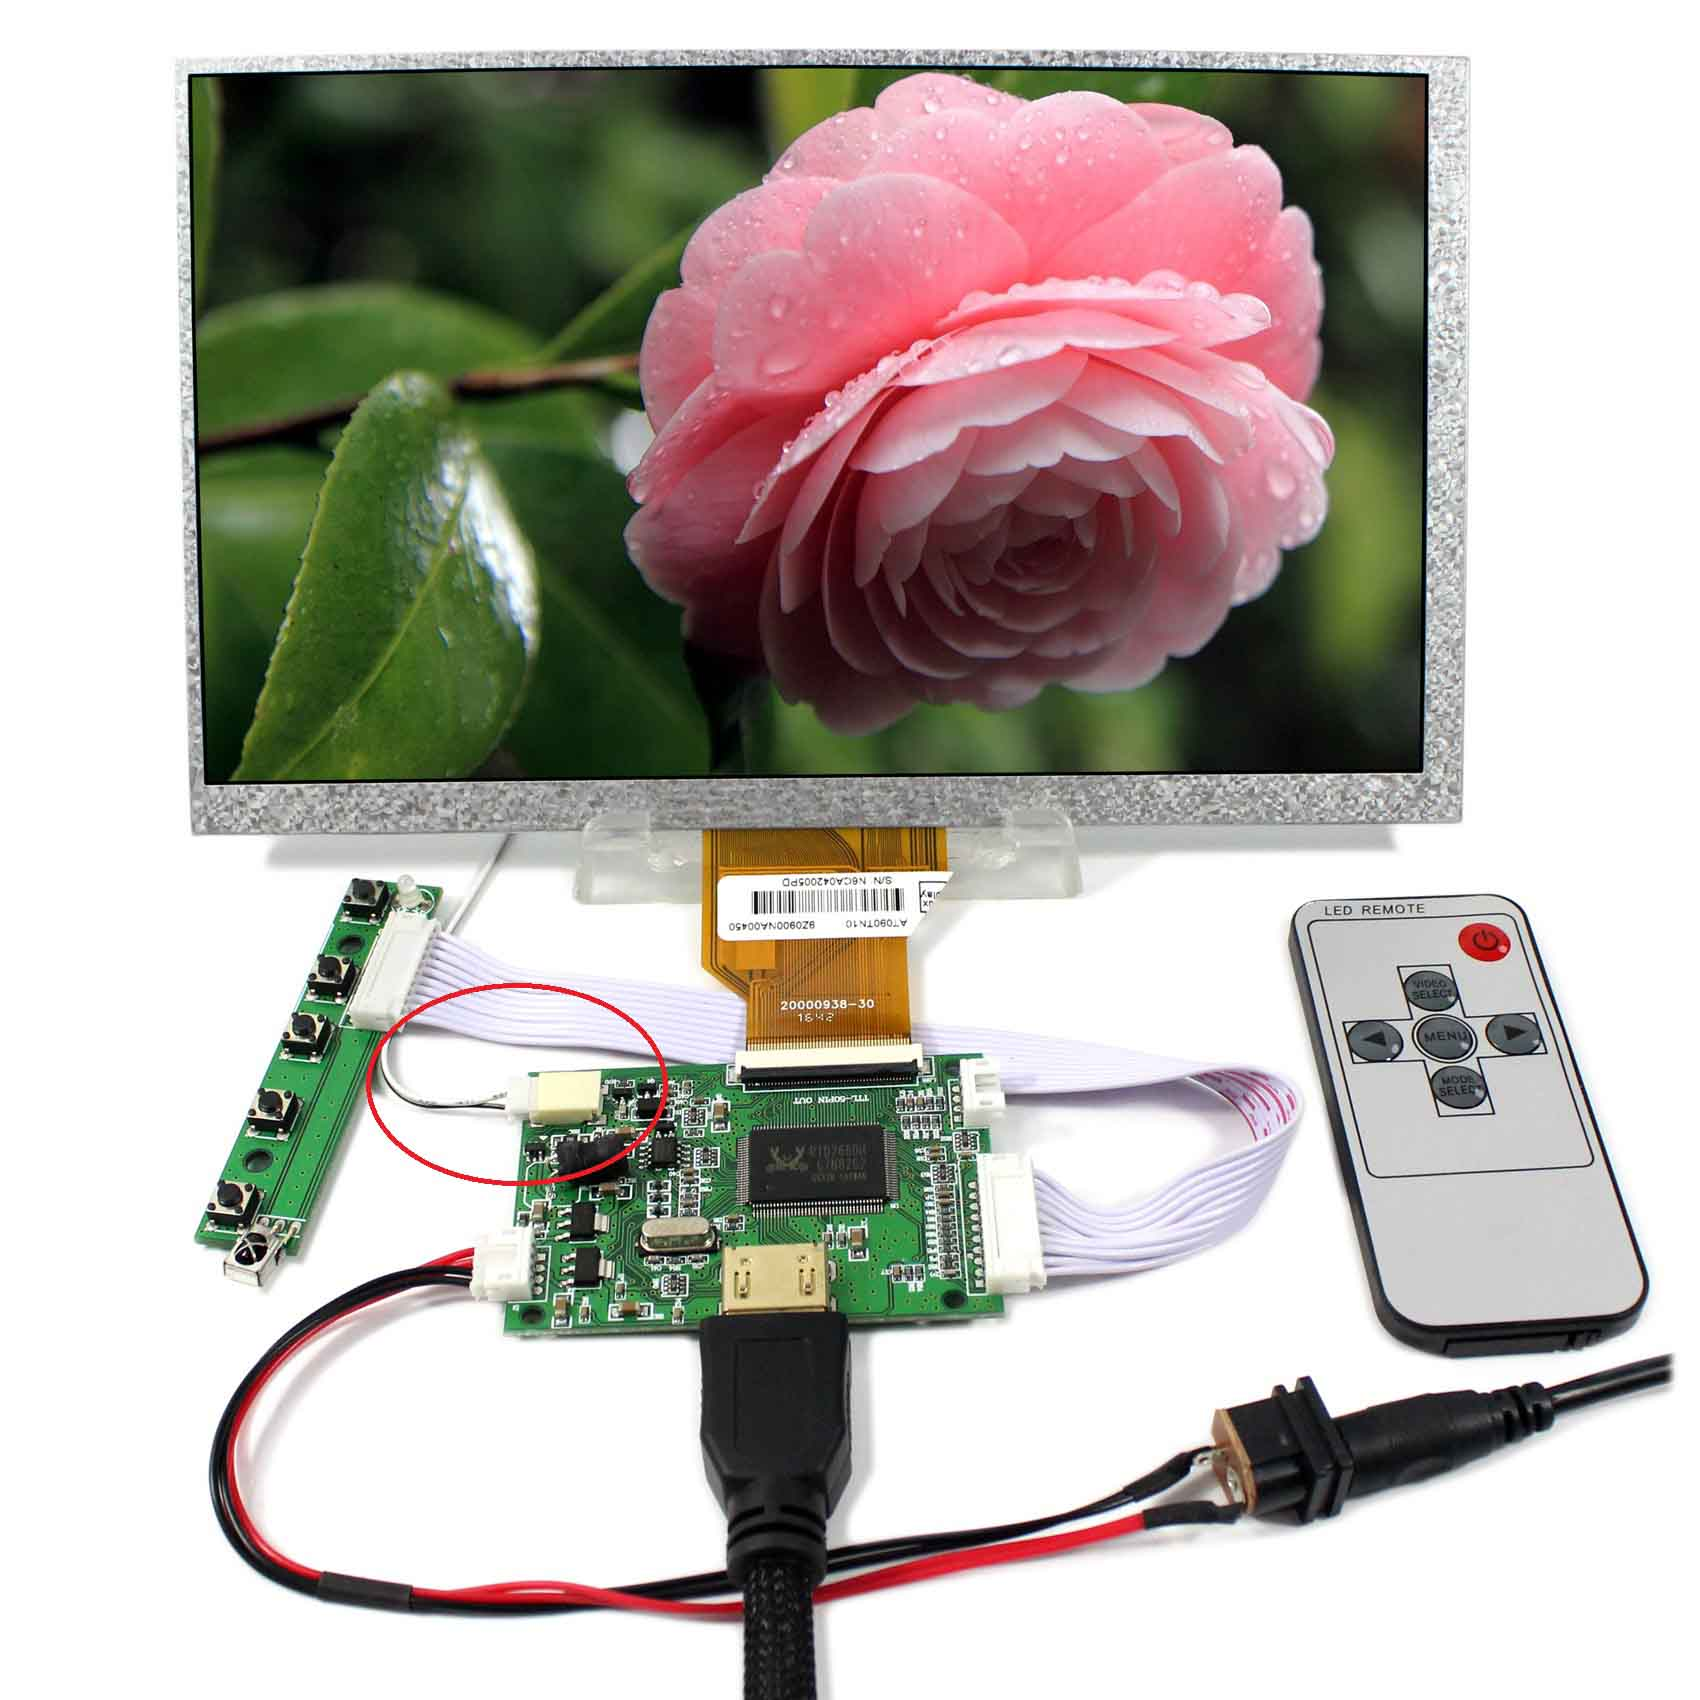 9inch 800x480 LCD HDMI LCD Controller Board AT090TN10 Remote Controller VS-TY50-V29inch 800x480 LCD HDMI LCD Controller Board AT090TN10 Remote Controller VS-TY50-V2